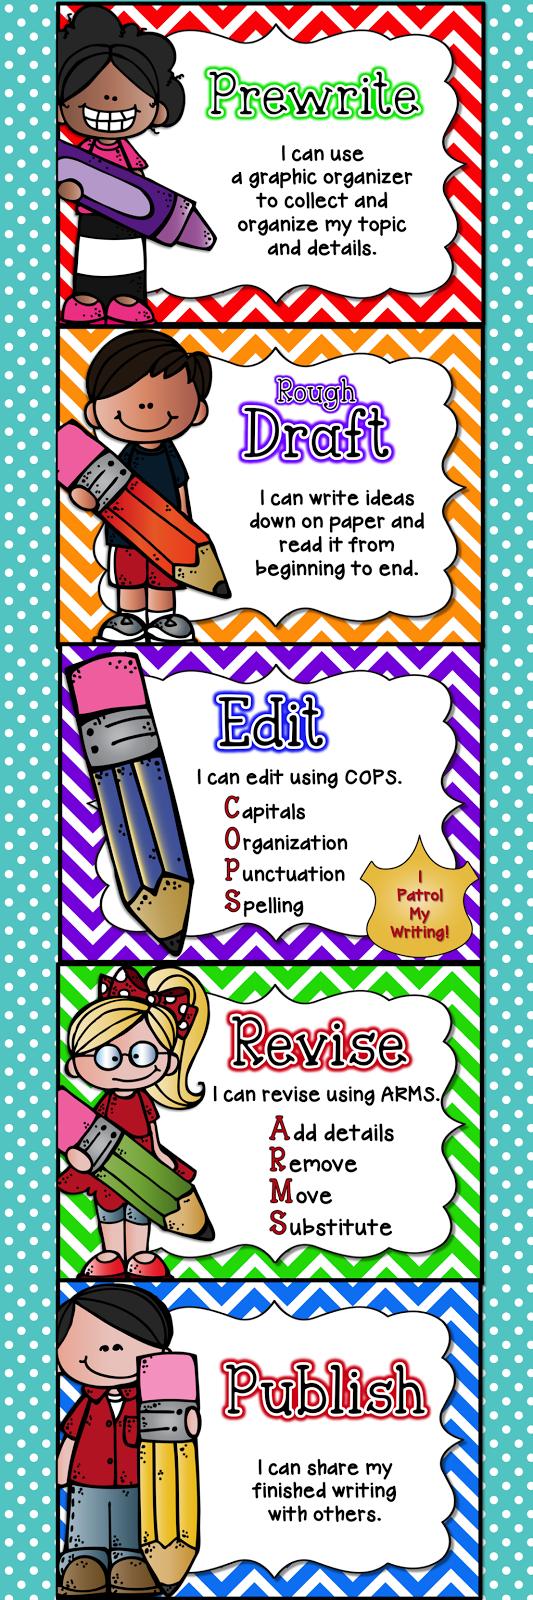 essay writing ideas kids